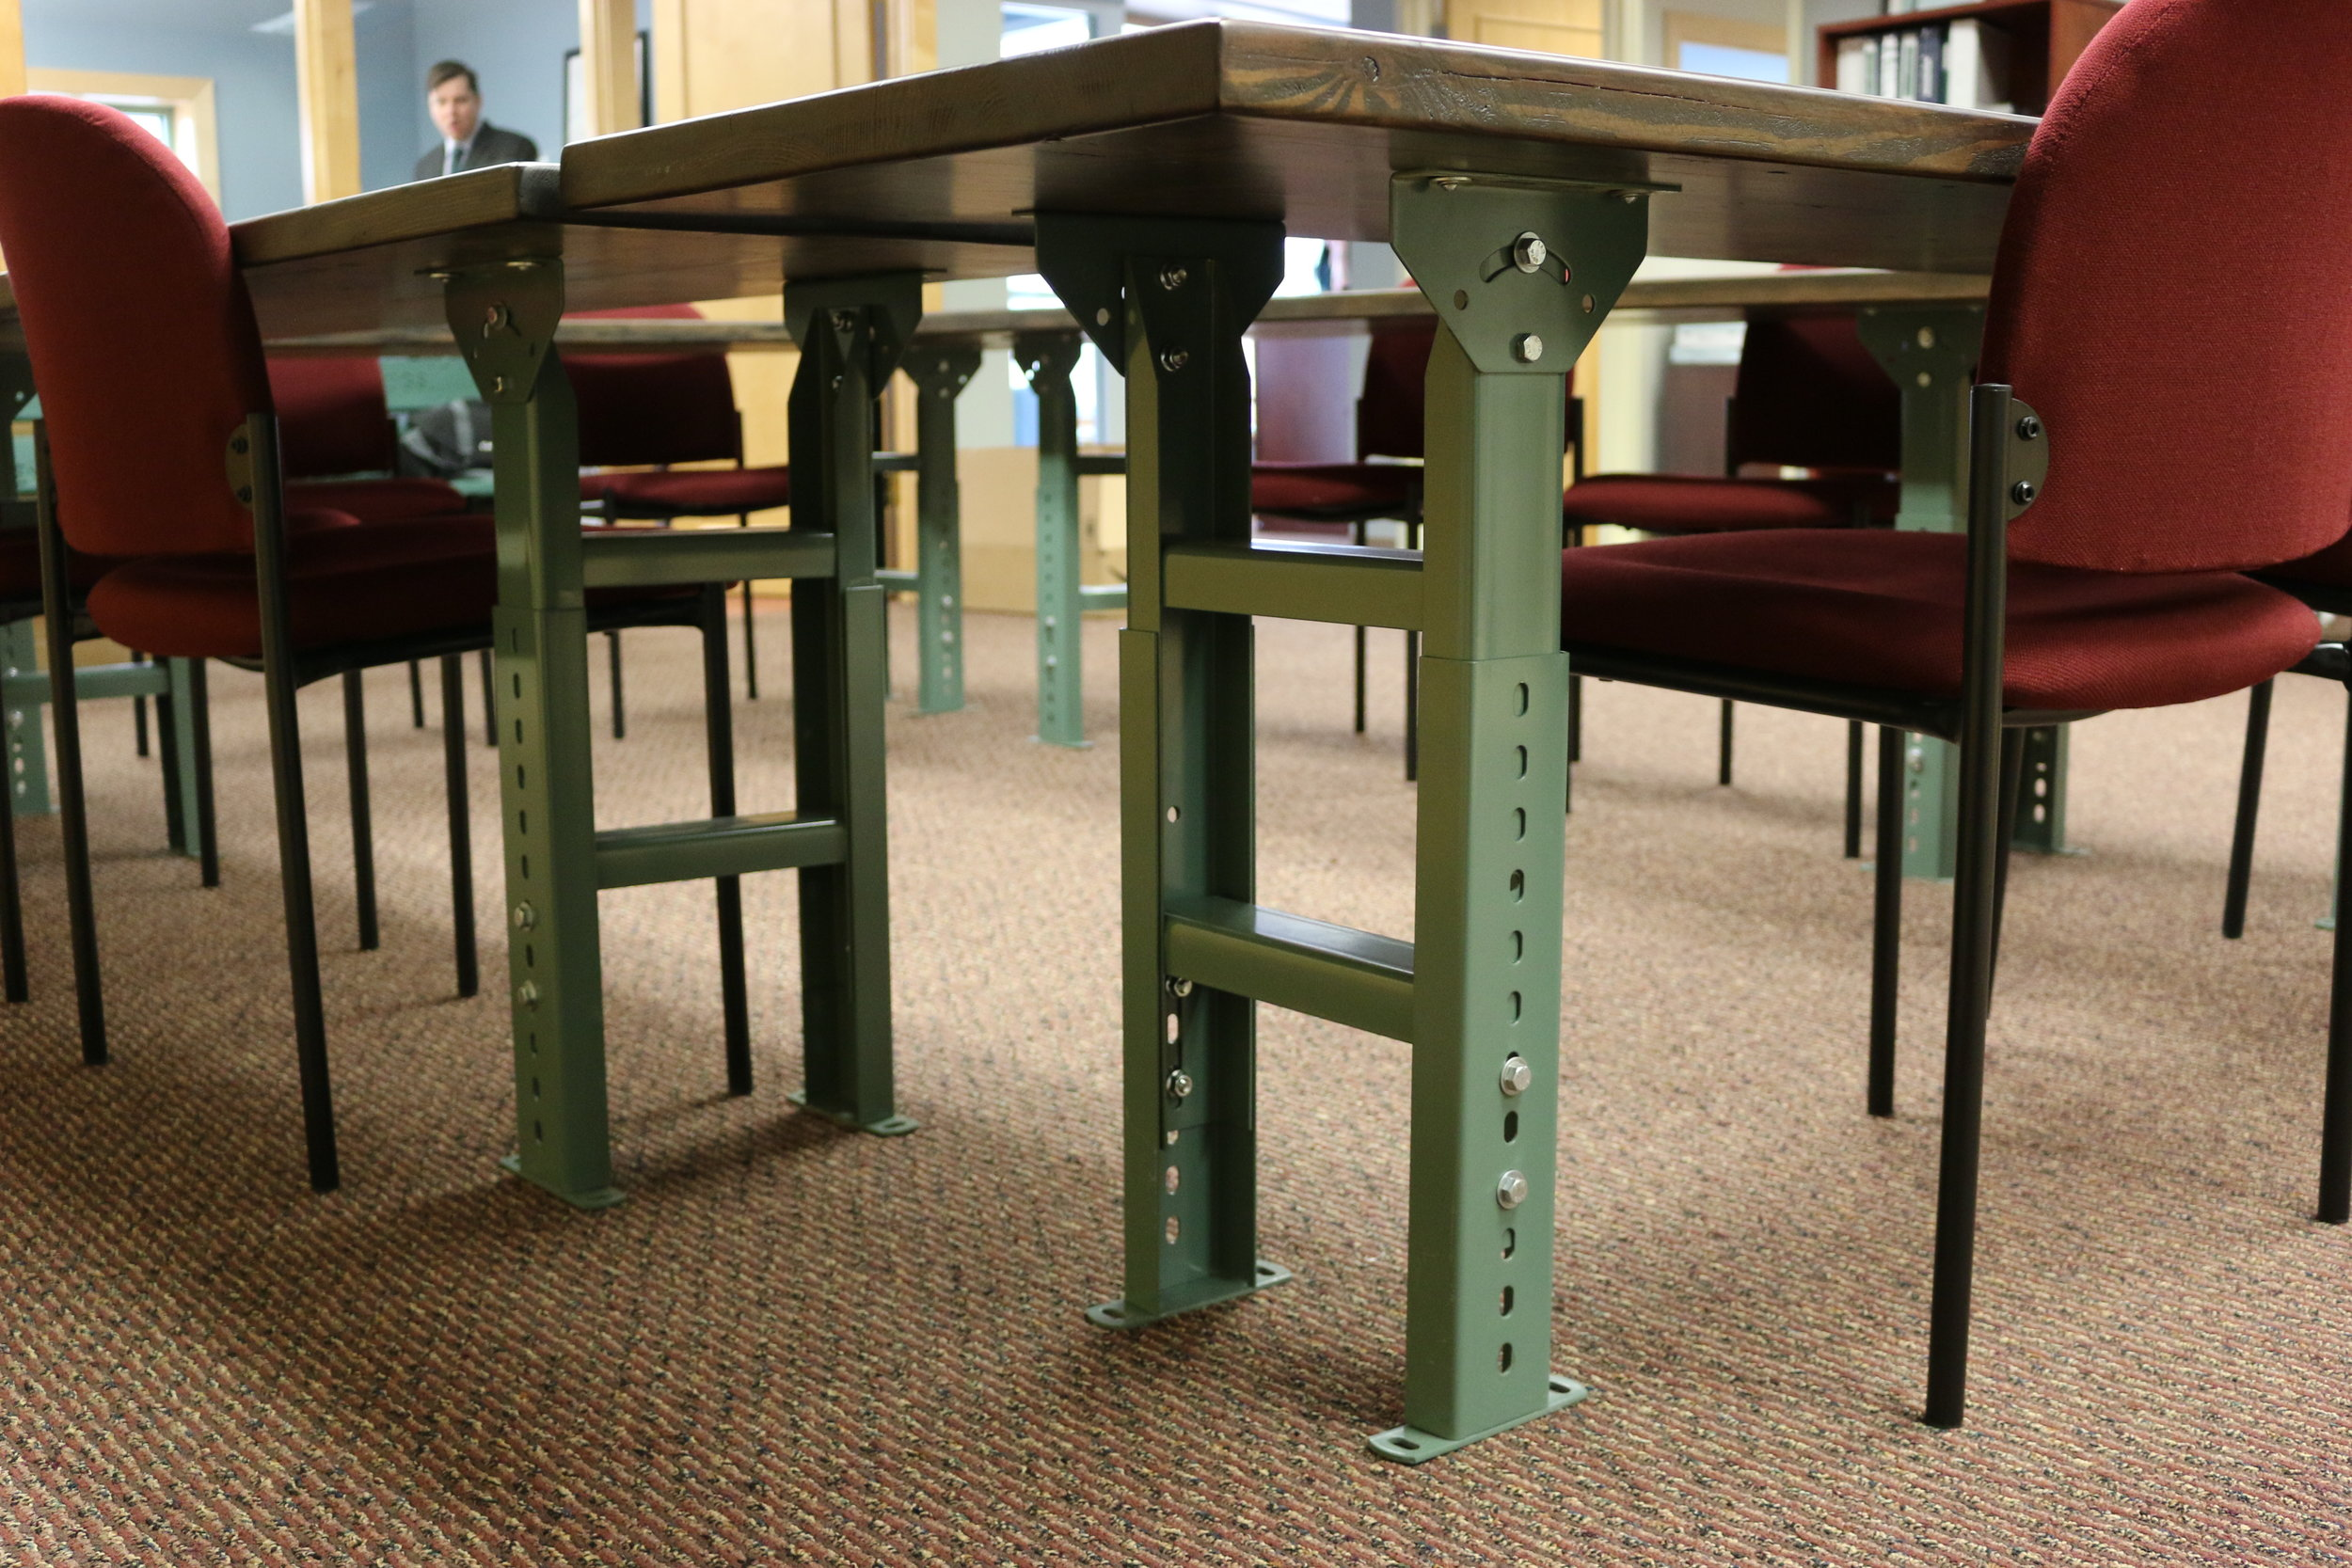 Sangamon Reclaimed Springfield Illinois Reclaimed wood table legs Illinois Environmental Council.JPG